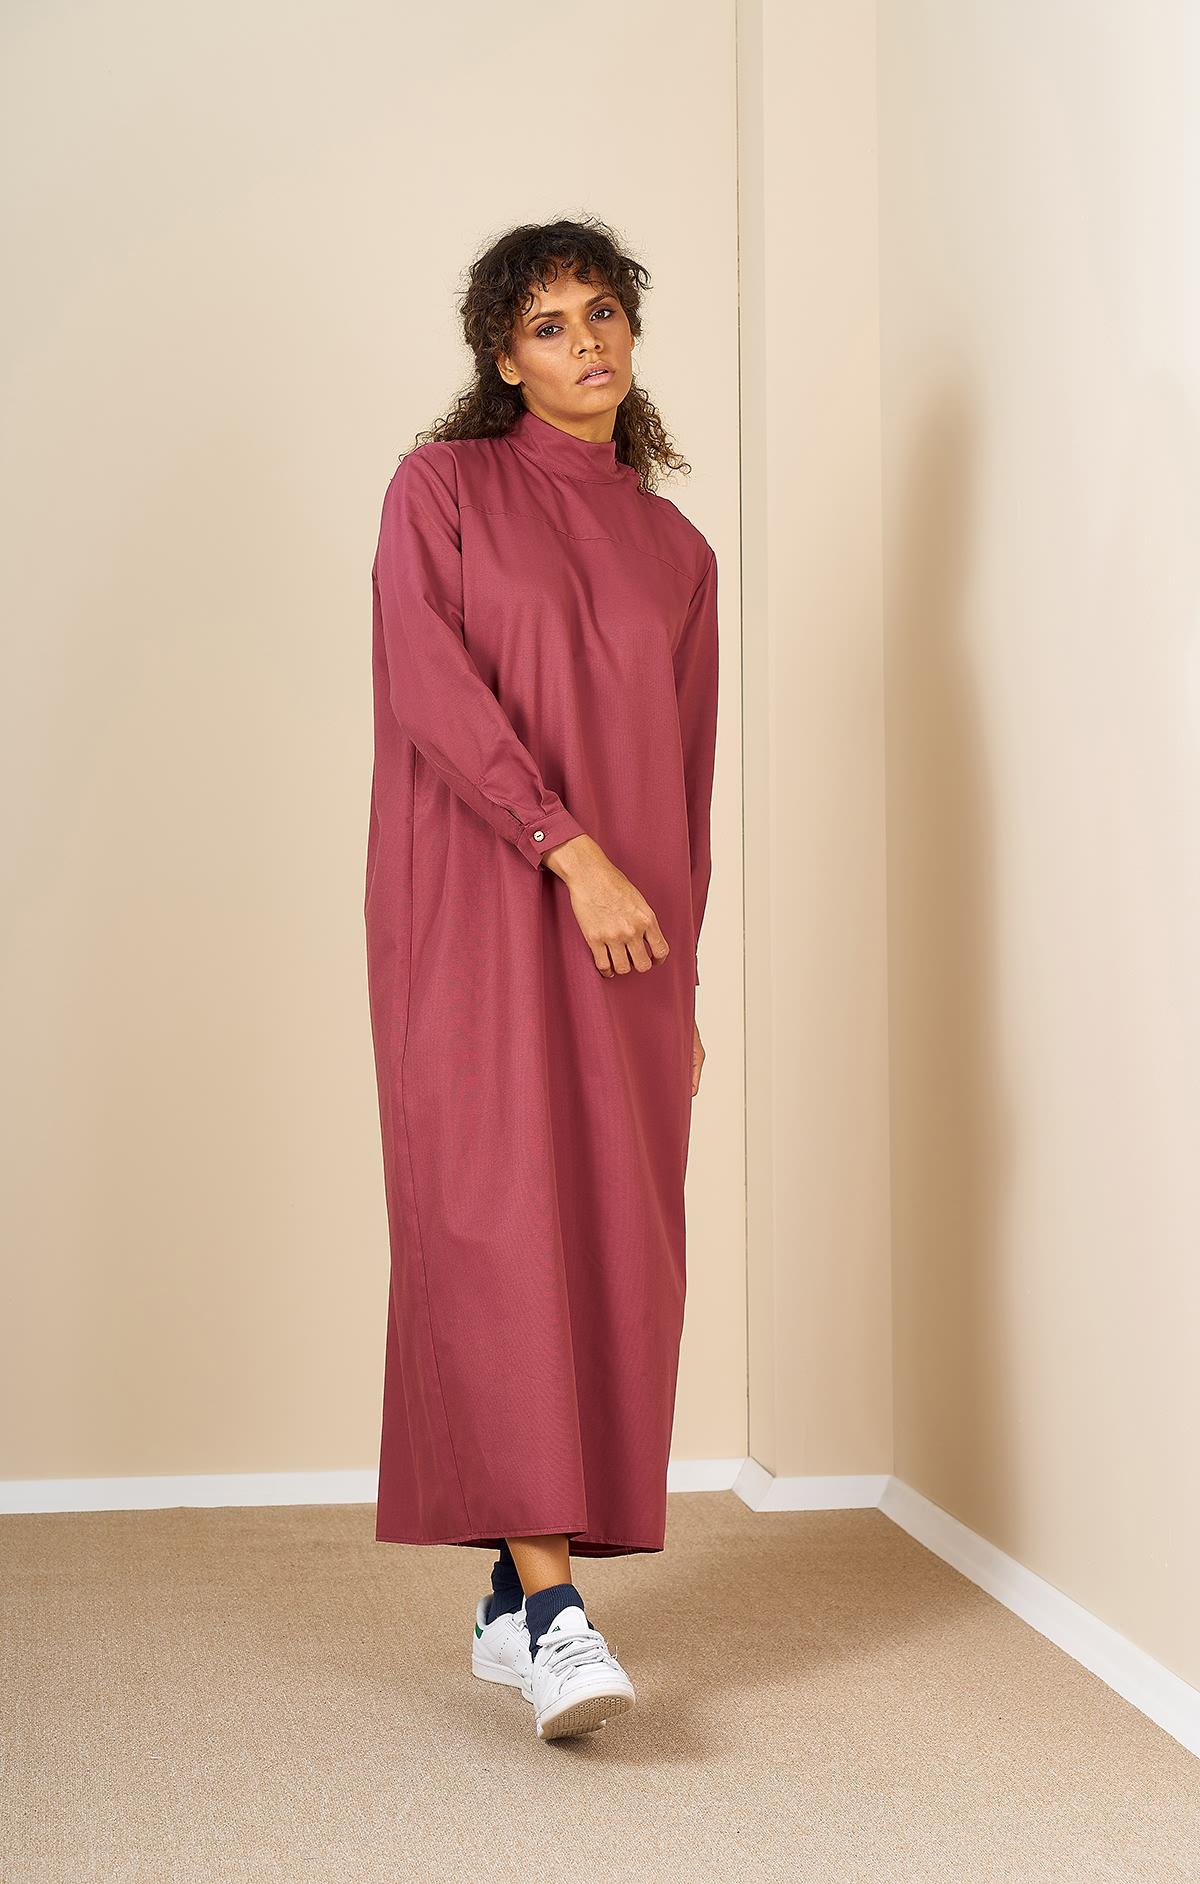 Mevra - Robalı Elbise Gülkurusu